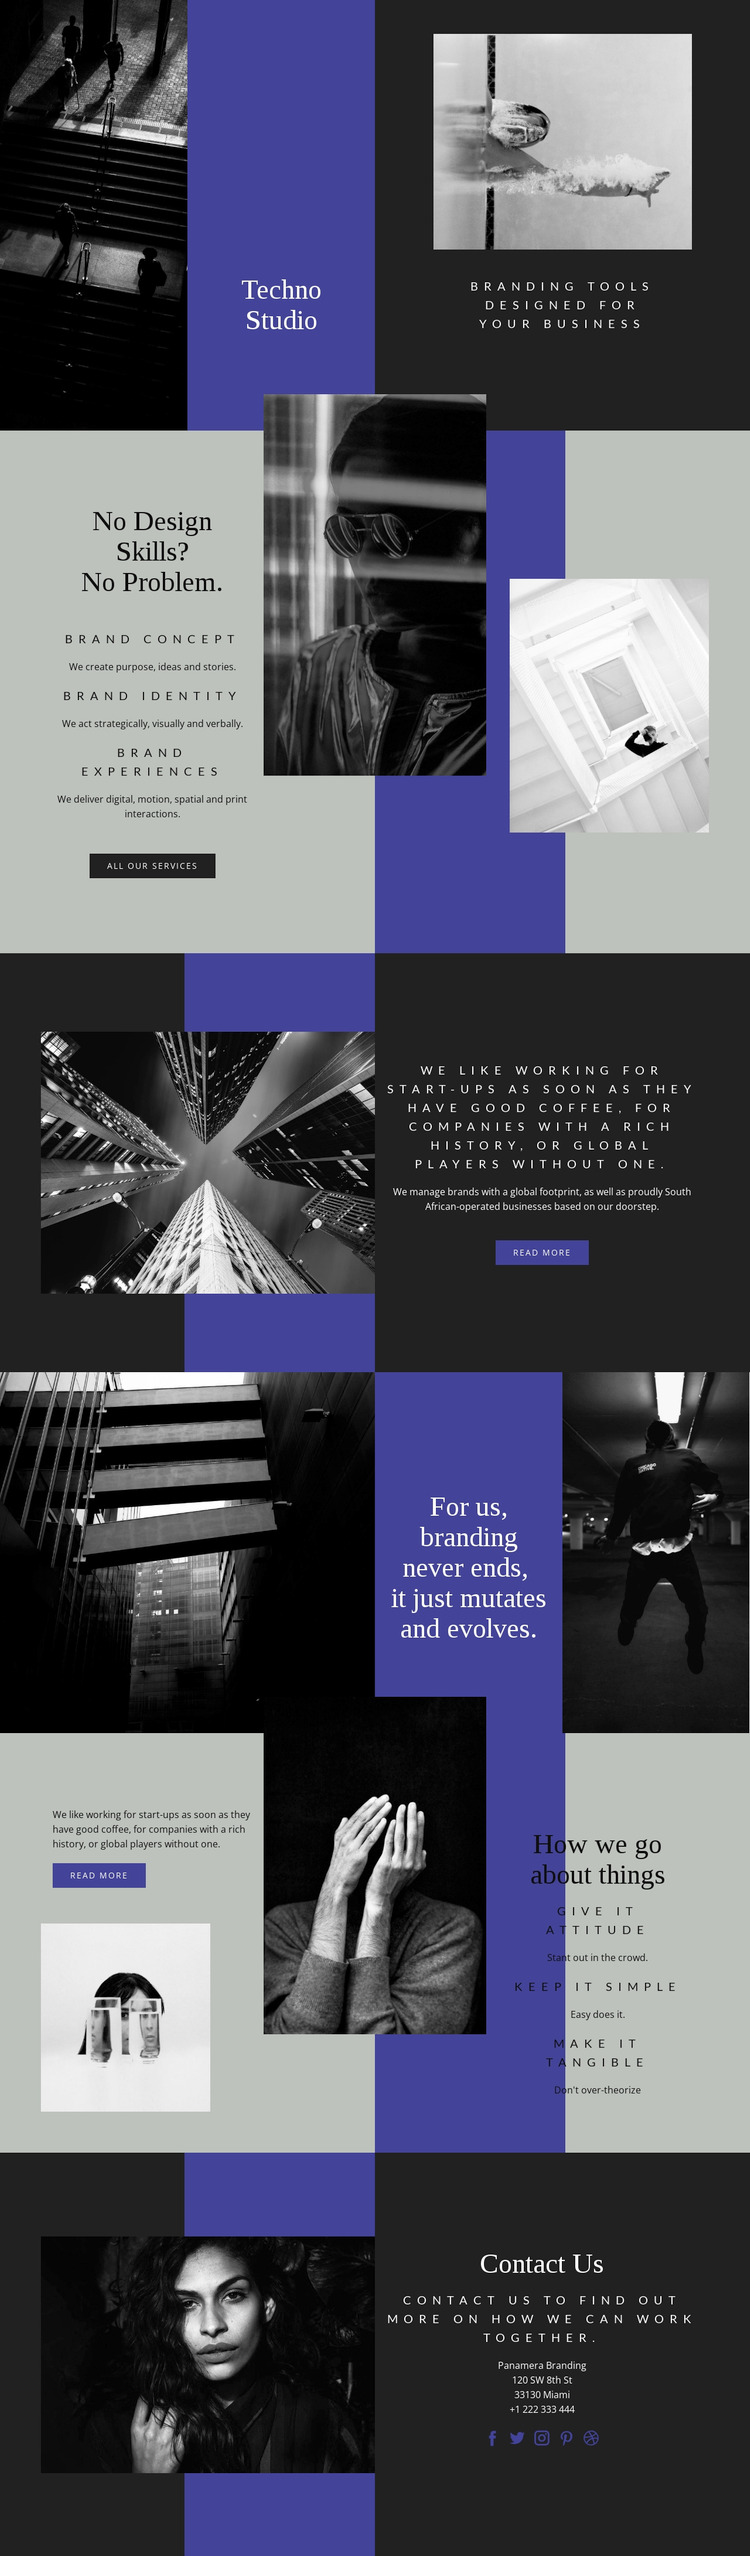 Techno skills in business WordPress Website Builder